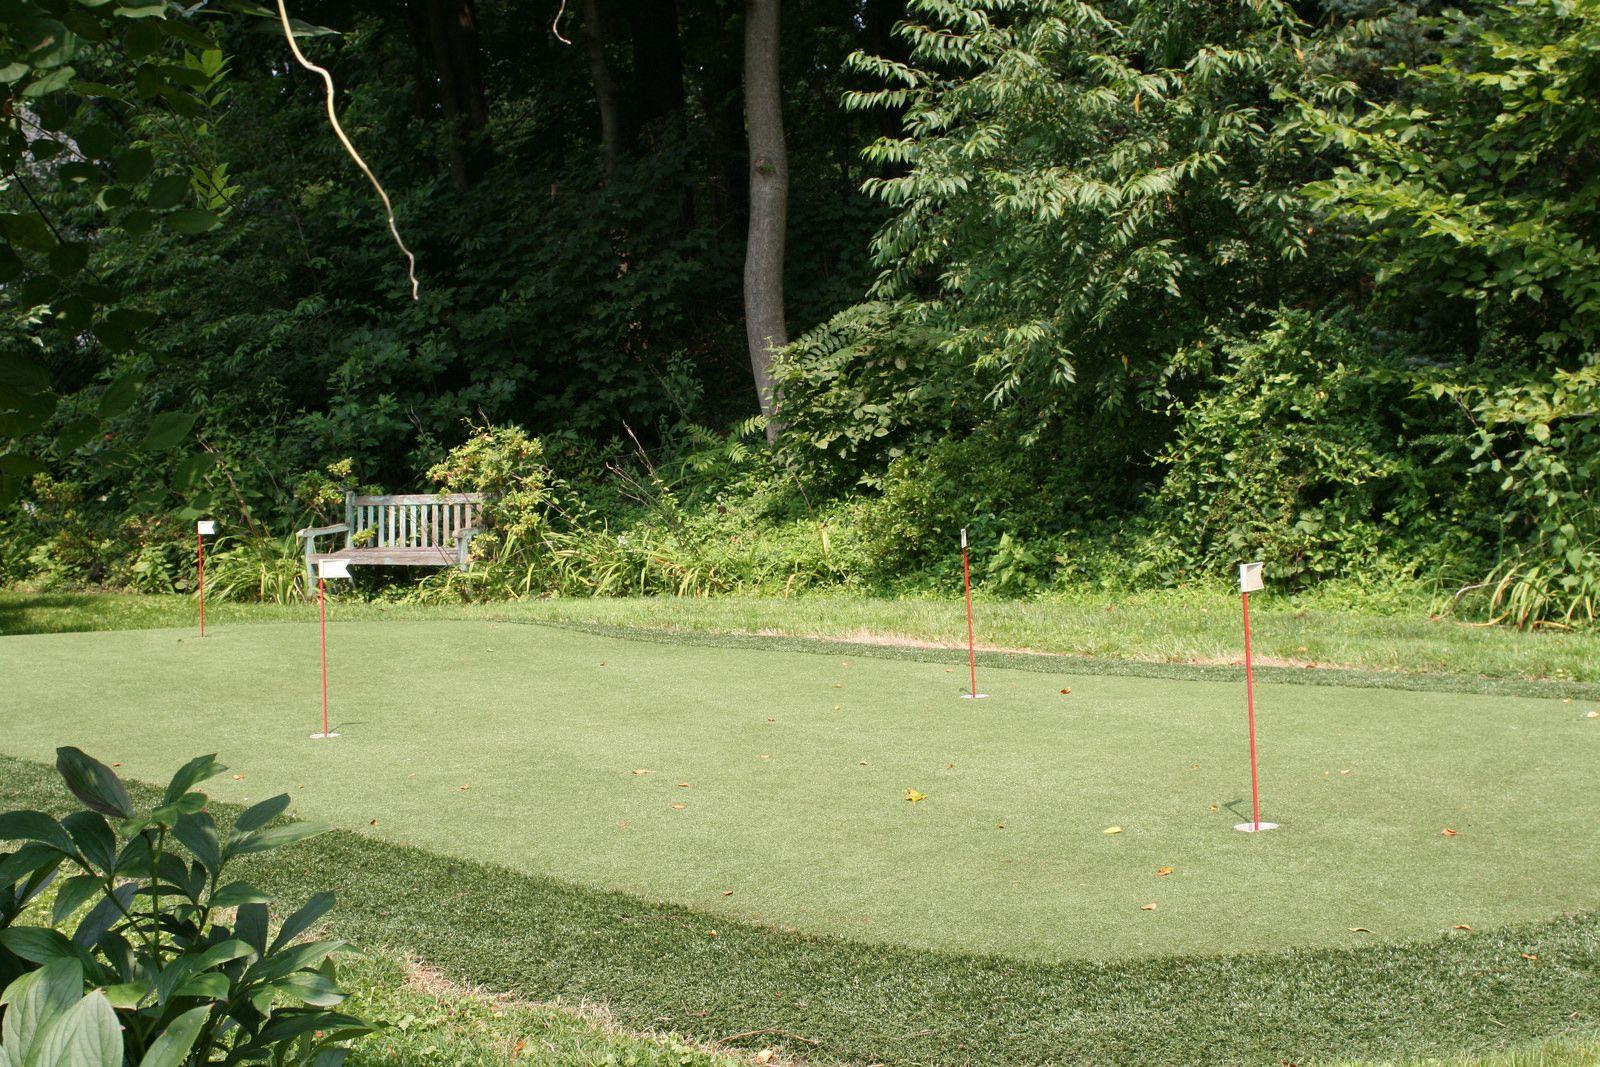 backyard golf course backyard and landscape designs